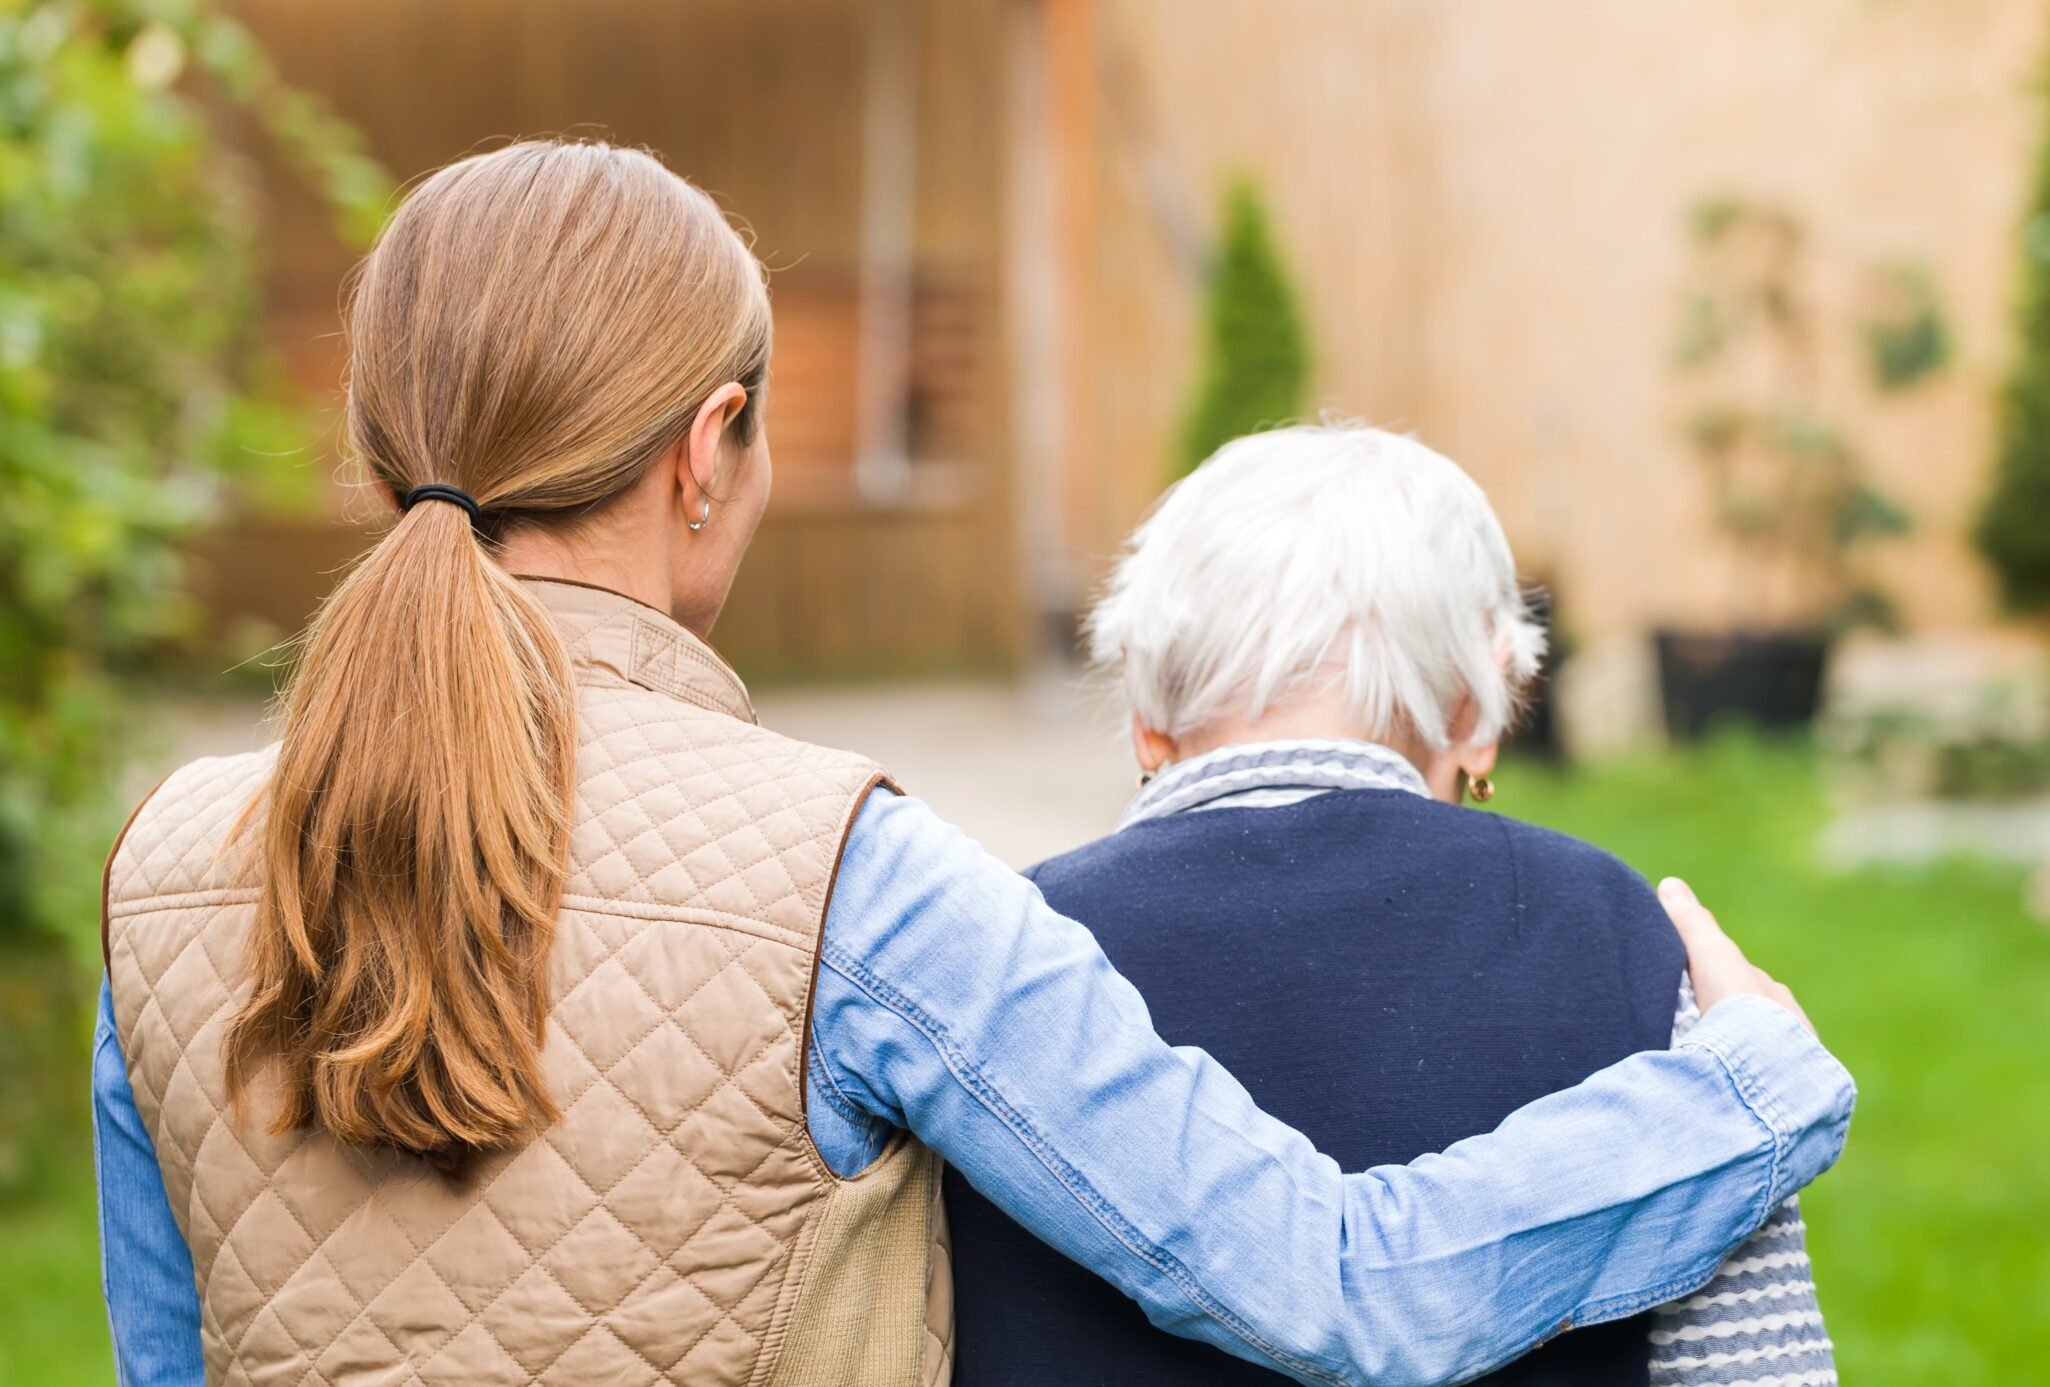 Female caretaker with arm around senior woman with dementia.